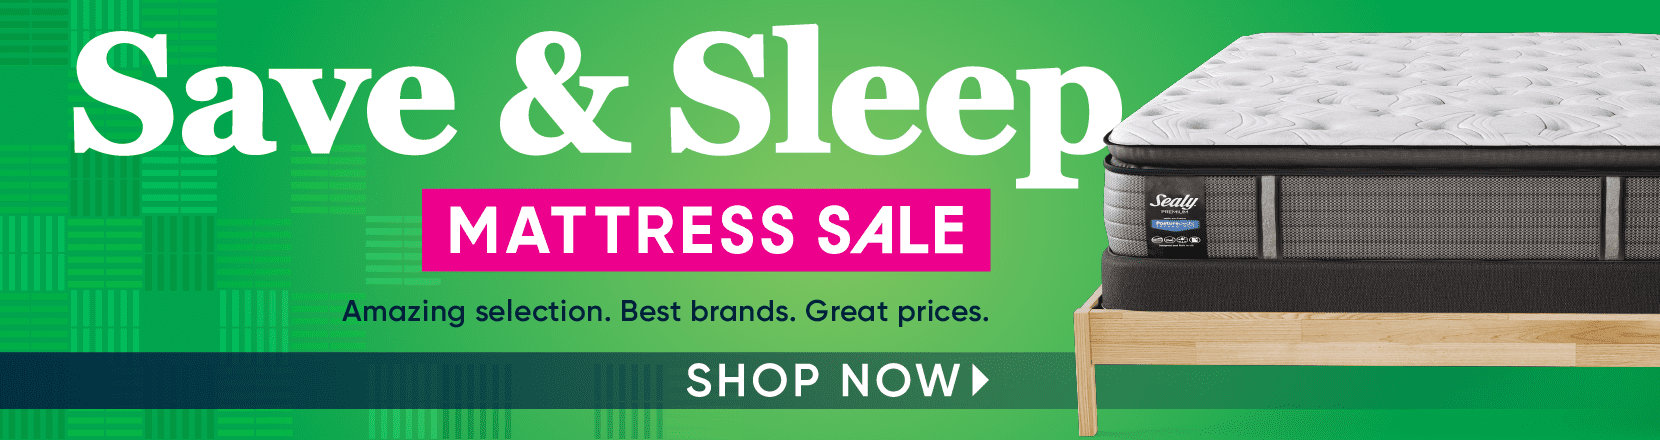 save & sleep. mattress sale. shop now